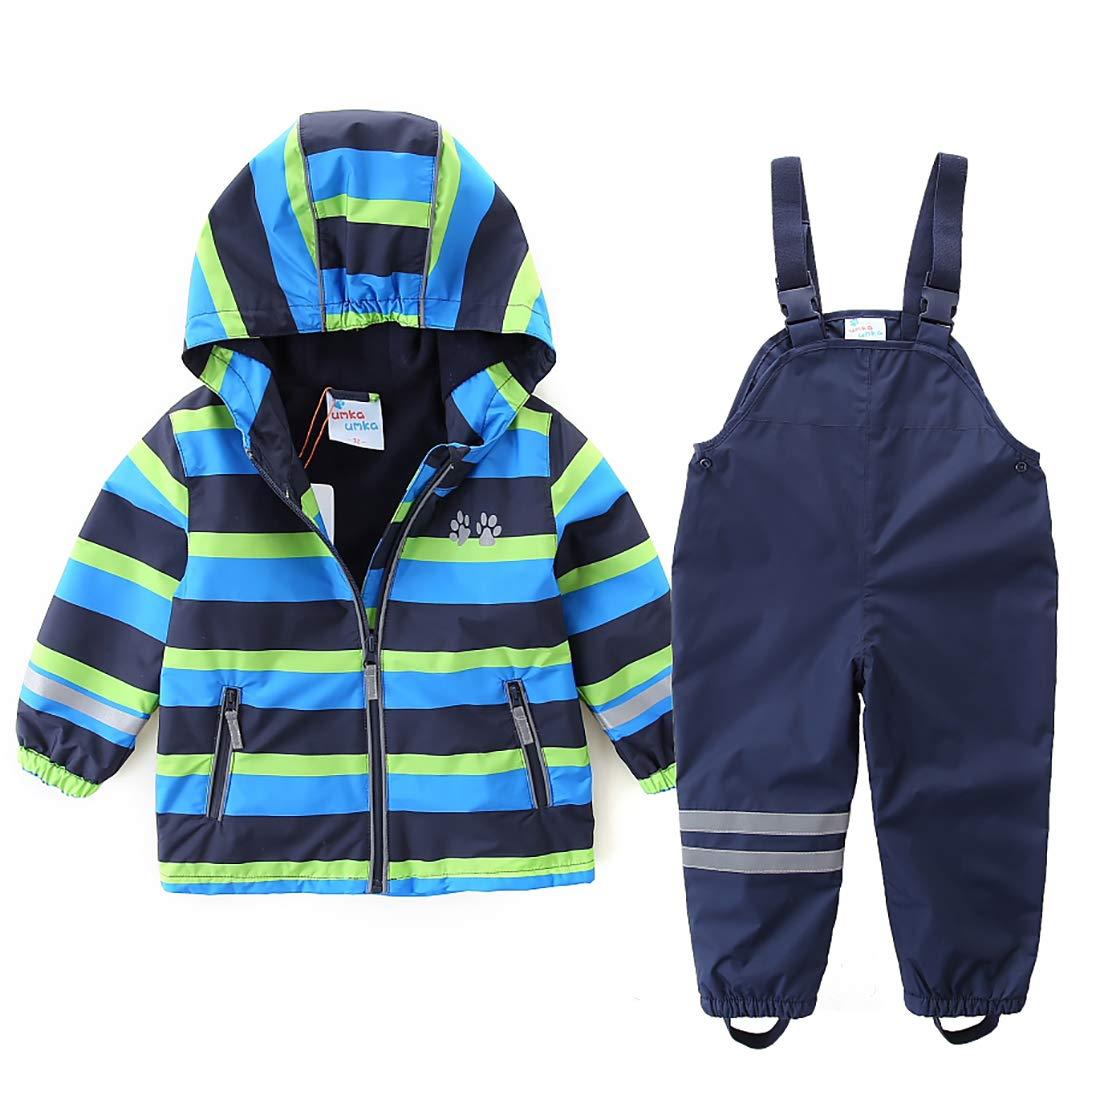 umkaumka Boys Girls Rain Suit Set Waterproof Jacket with Pants Kids Hooded Rainwear Set (4T (104)) by umkaumka